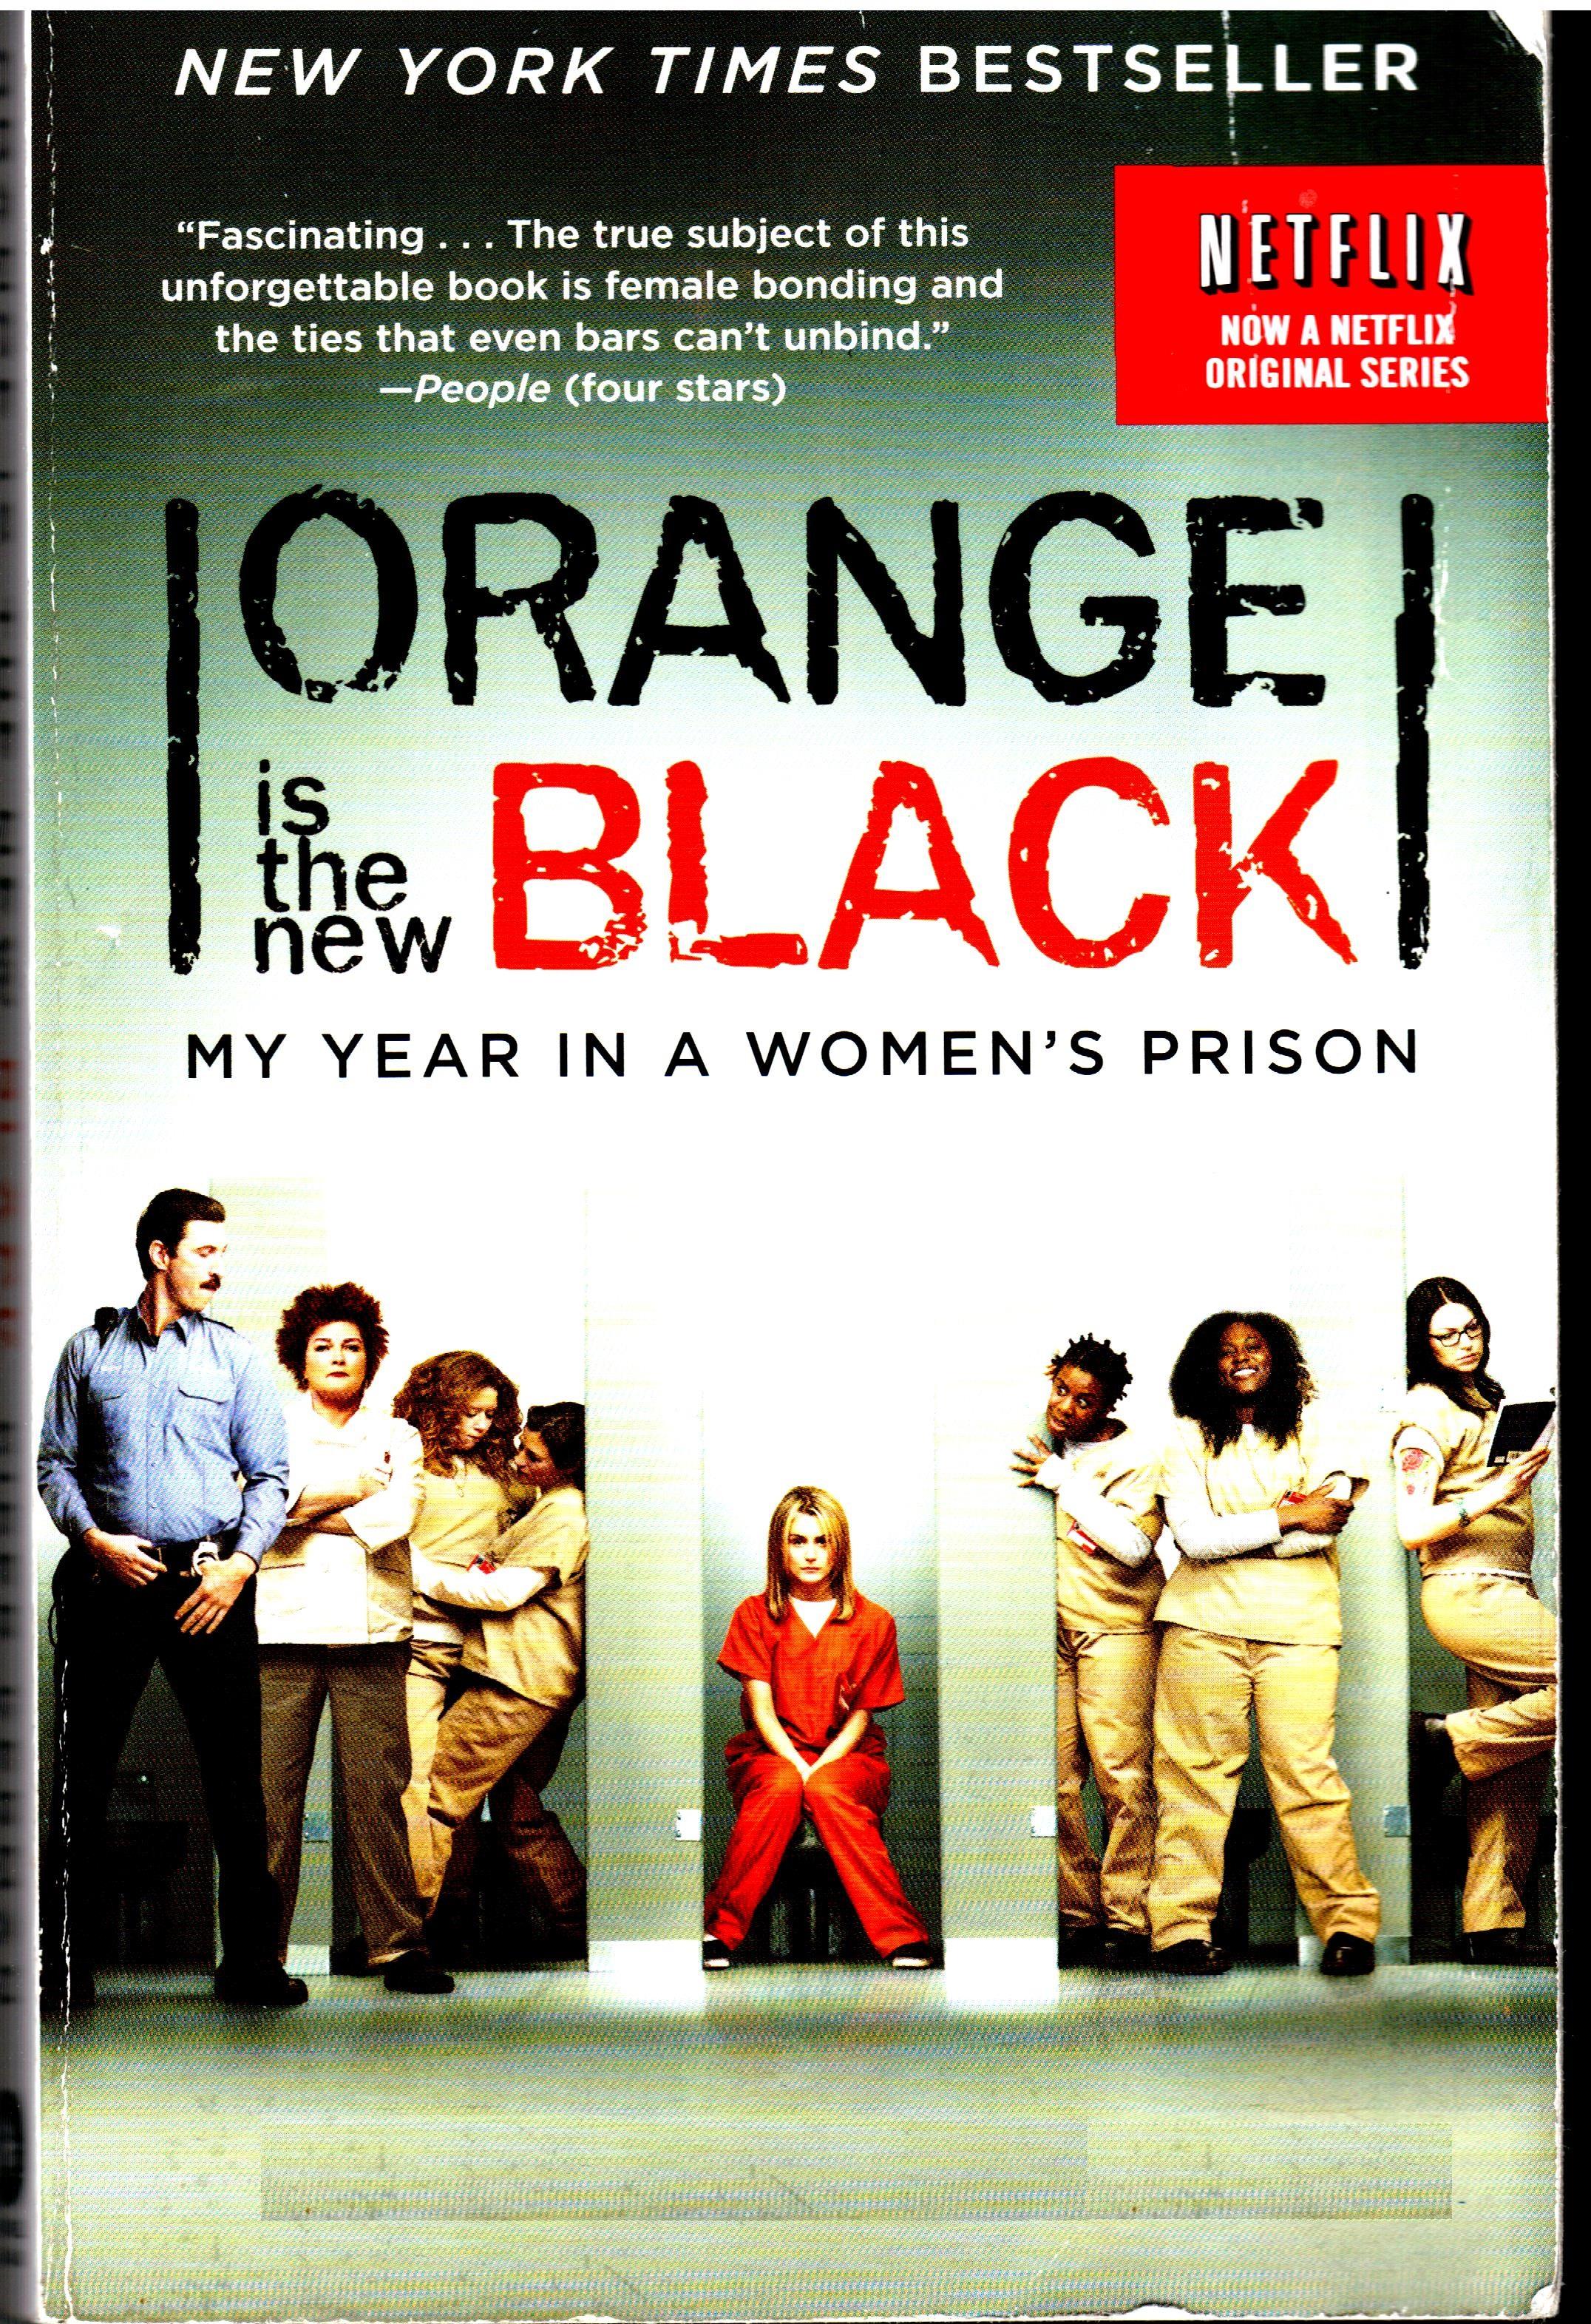 orange is the new black trailer